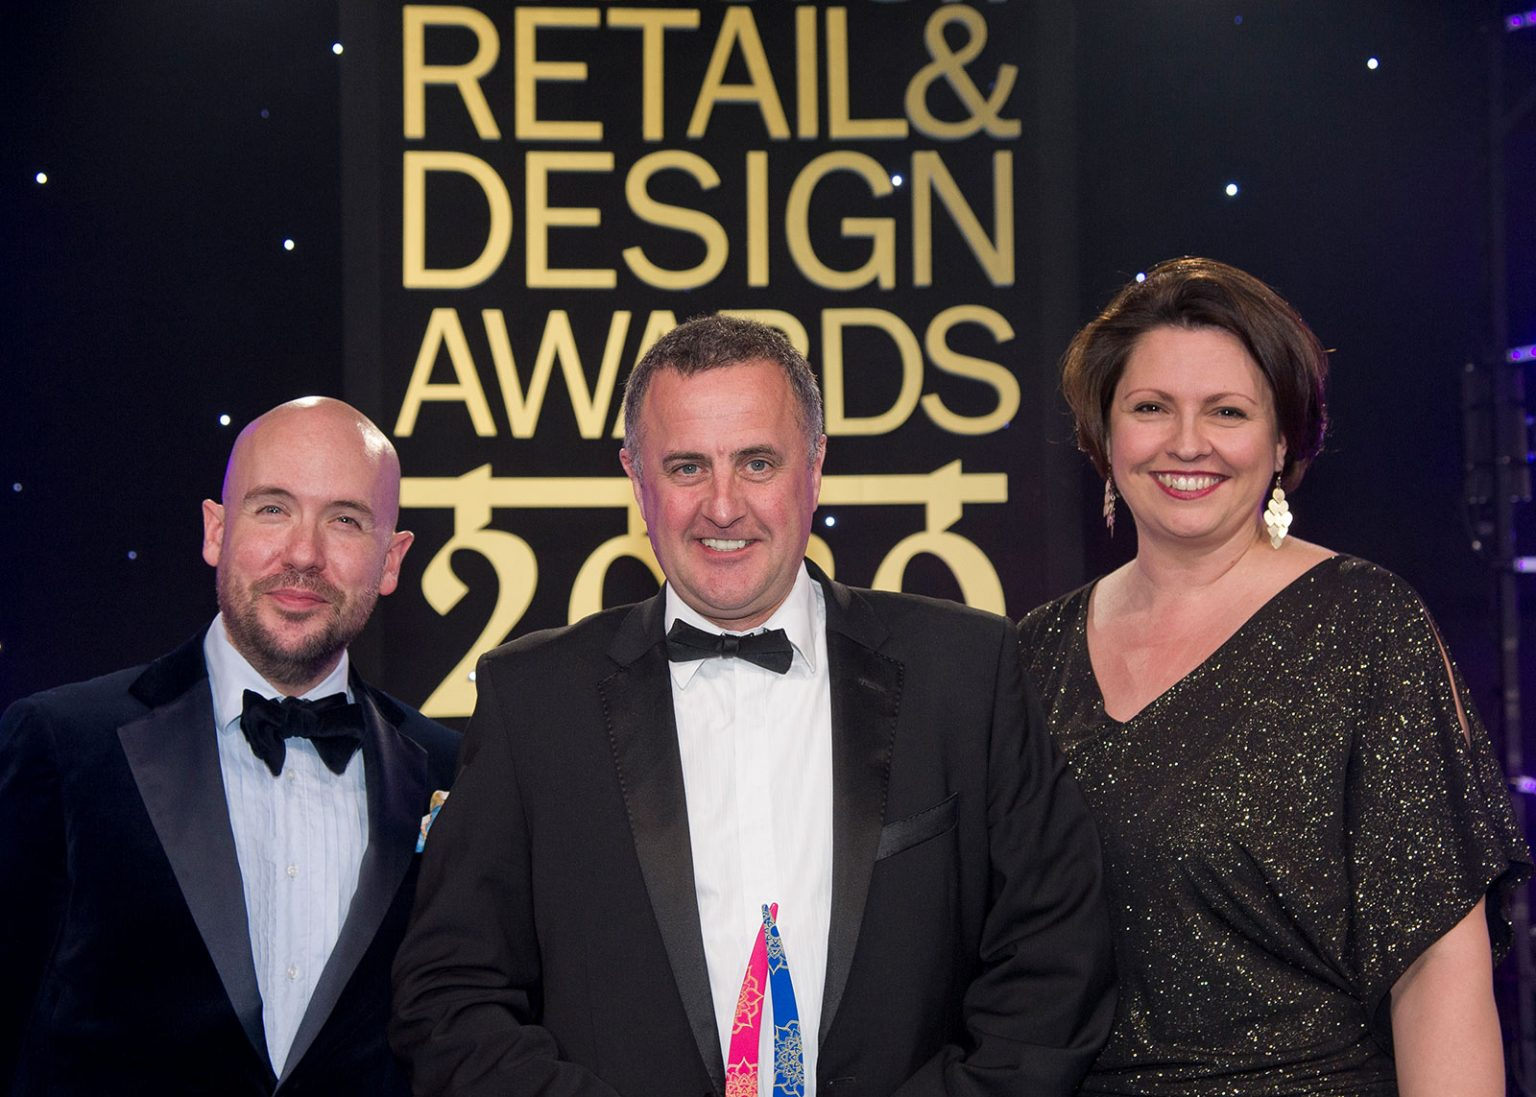 Winners of the KBBA Award for Customer Service